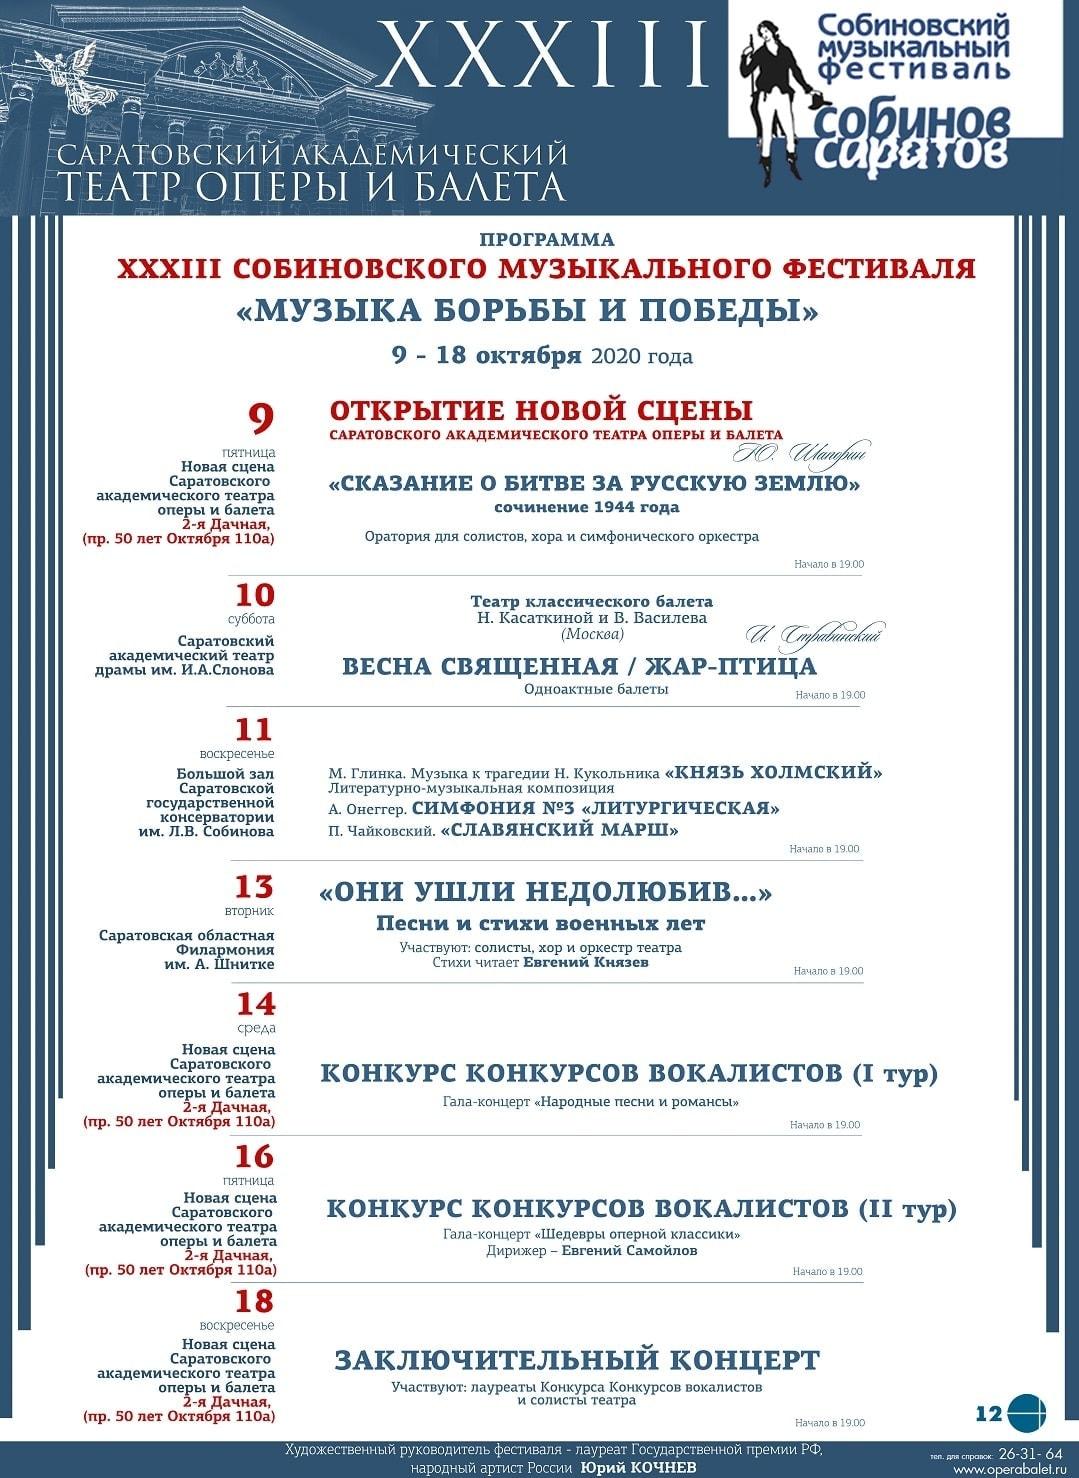 Саратовский театр оперы и балета объявил программу XXXIII Собиновского фестиваля